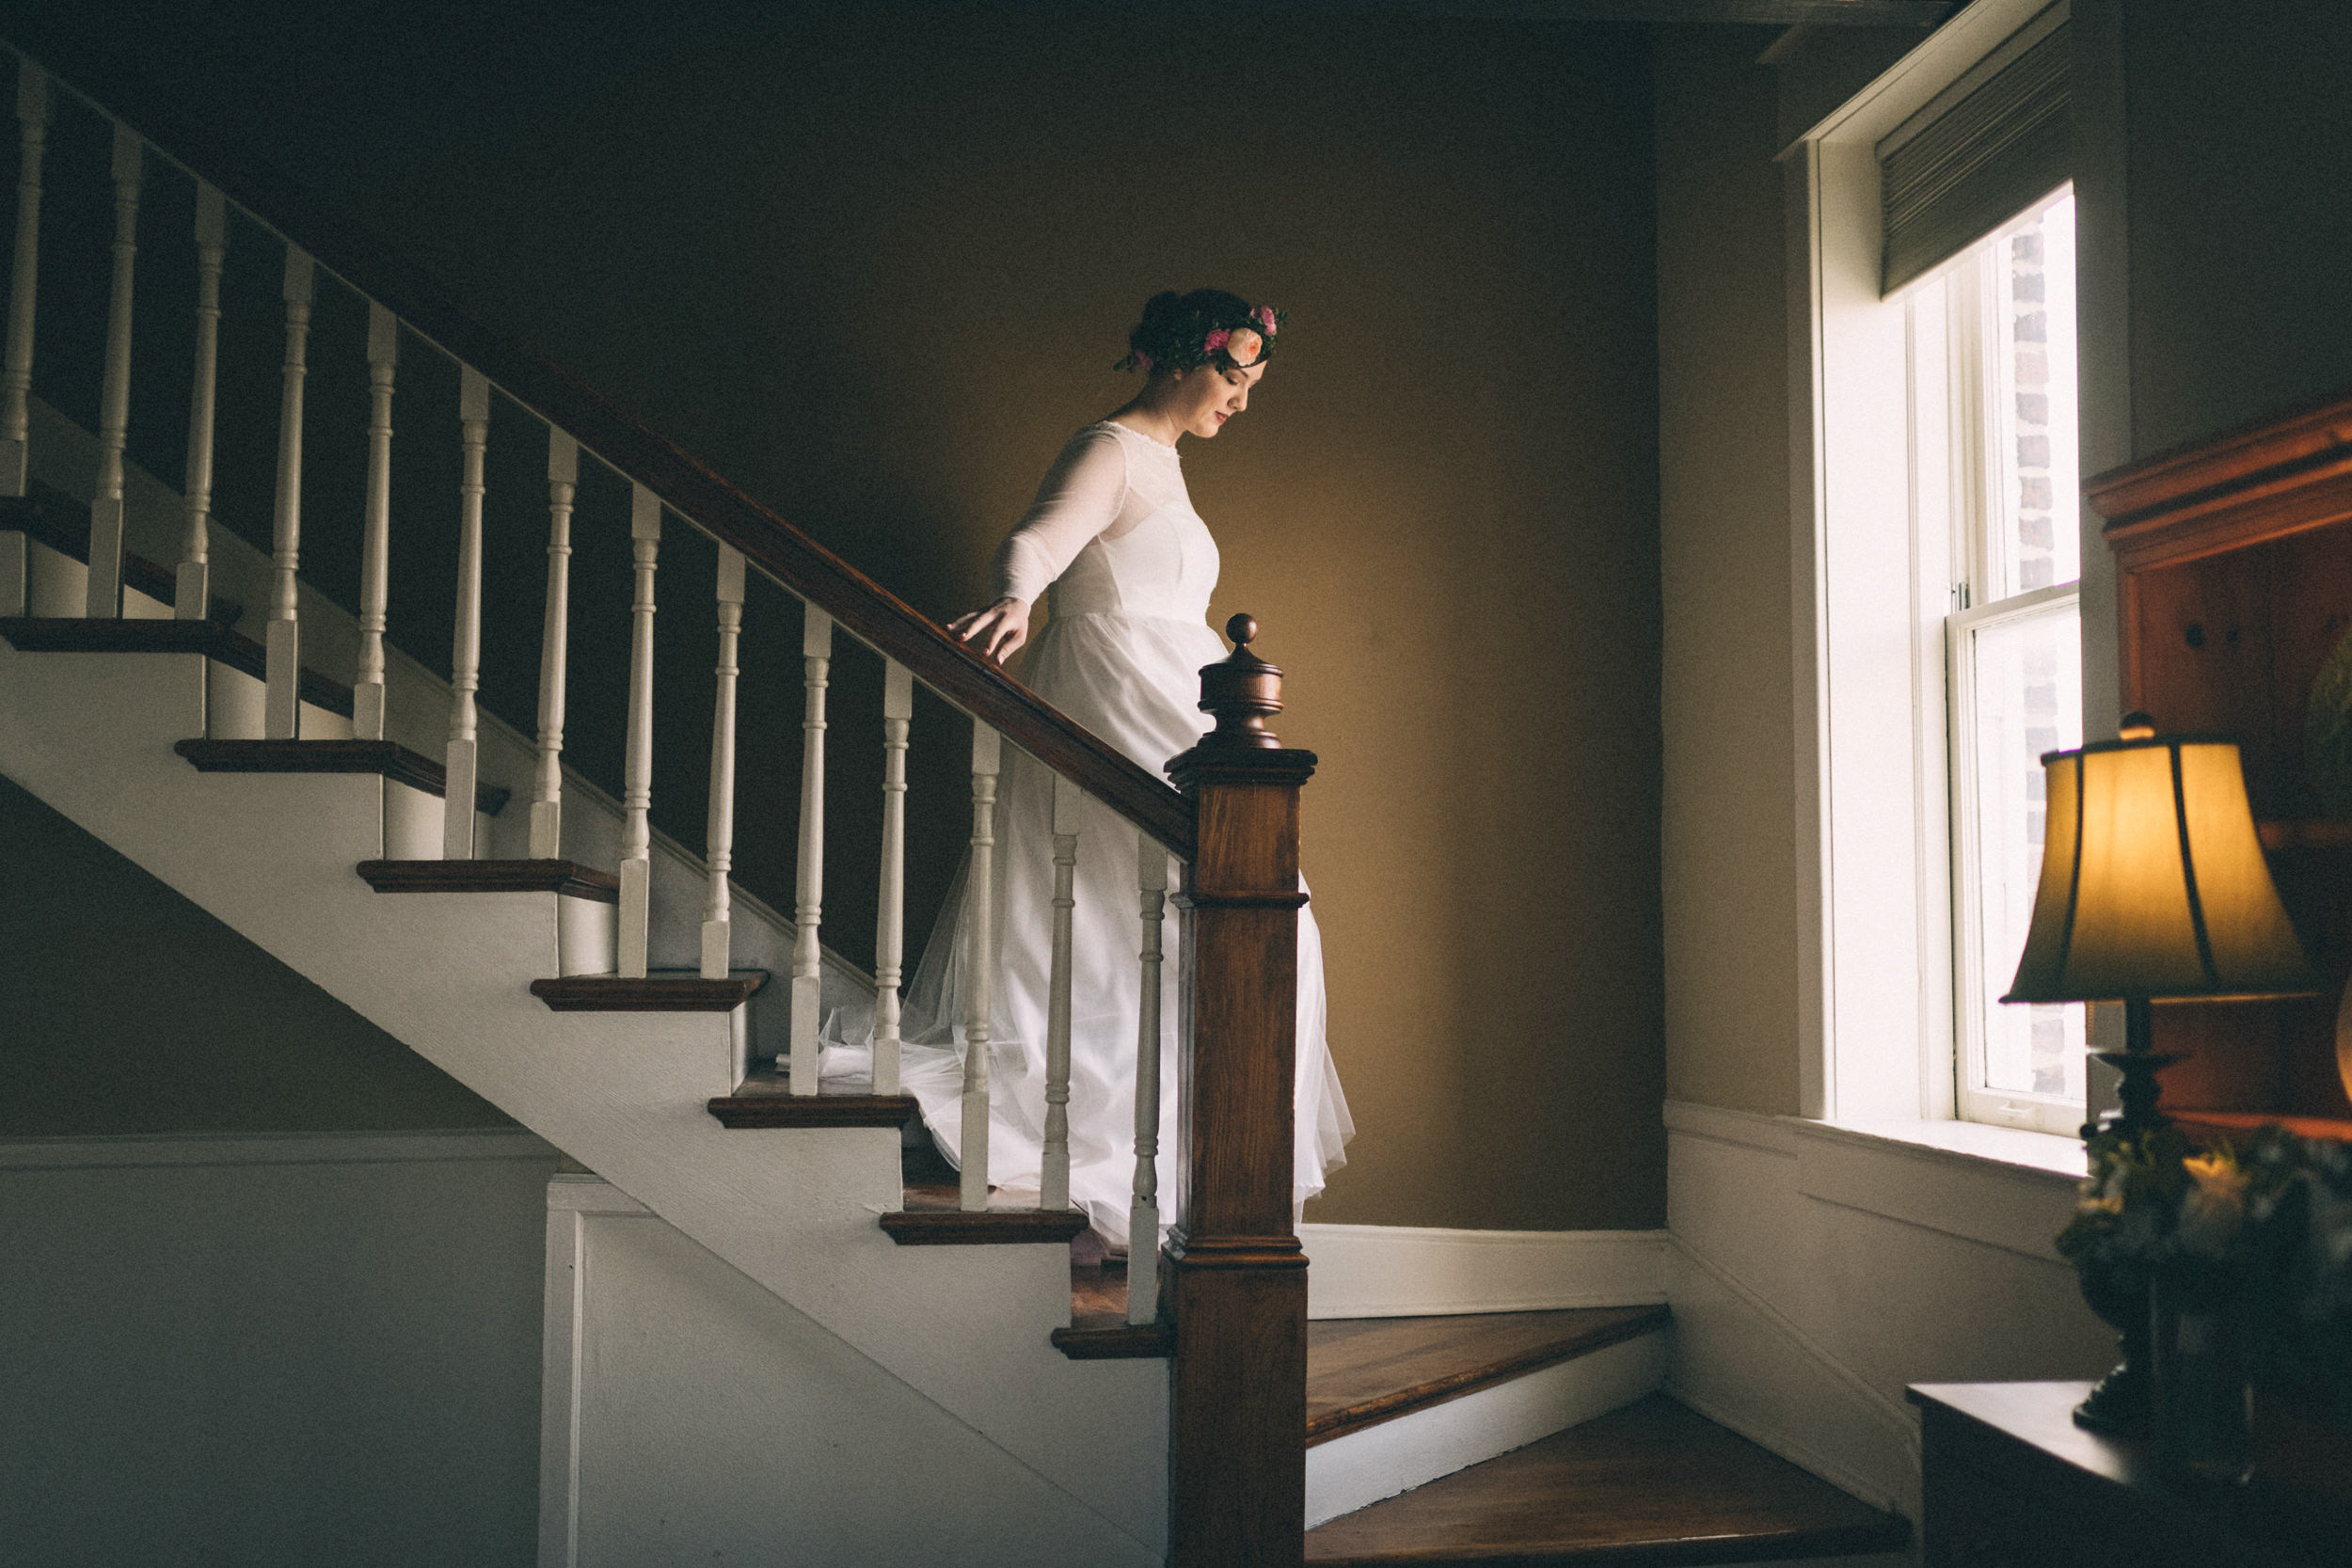 lauren-dean-wedding-grand-lodge-kentucky-sarah-katherine-davis-photography-129edit.jpg